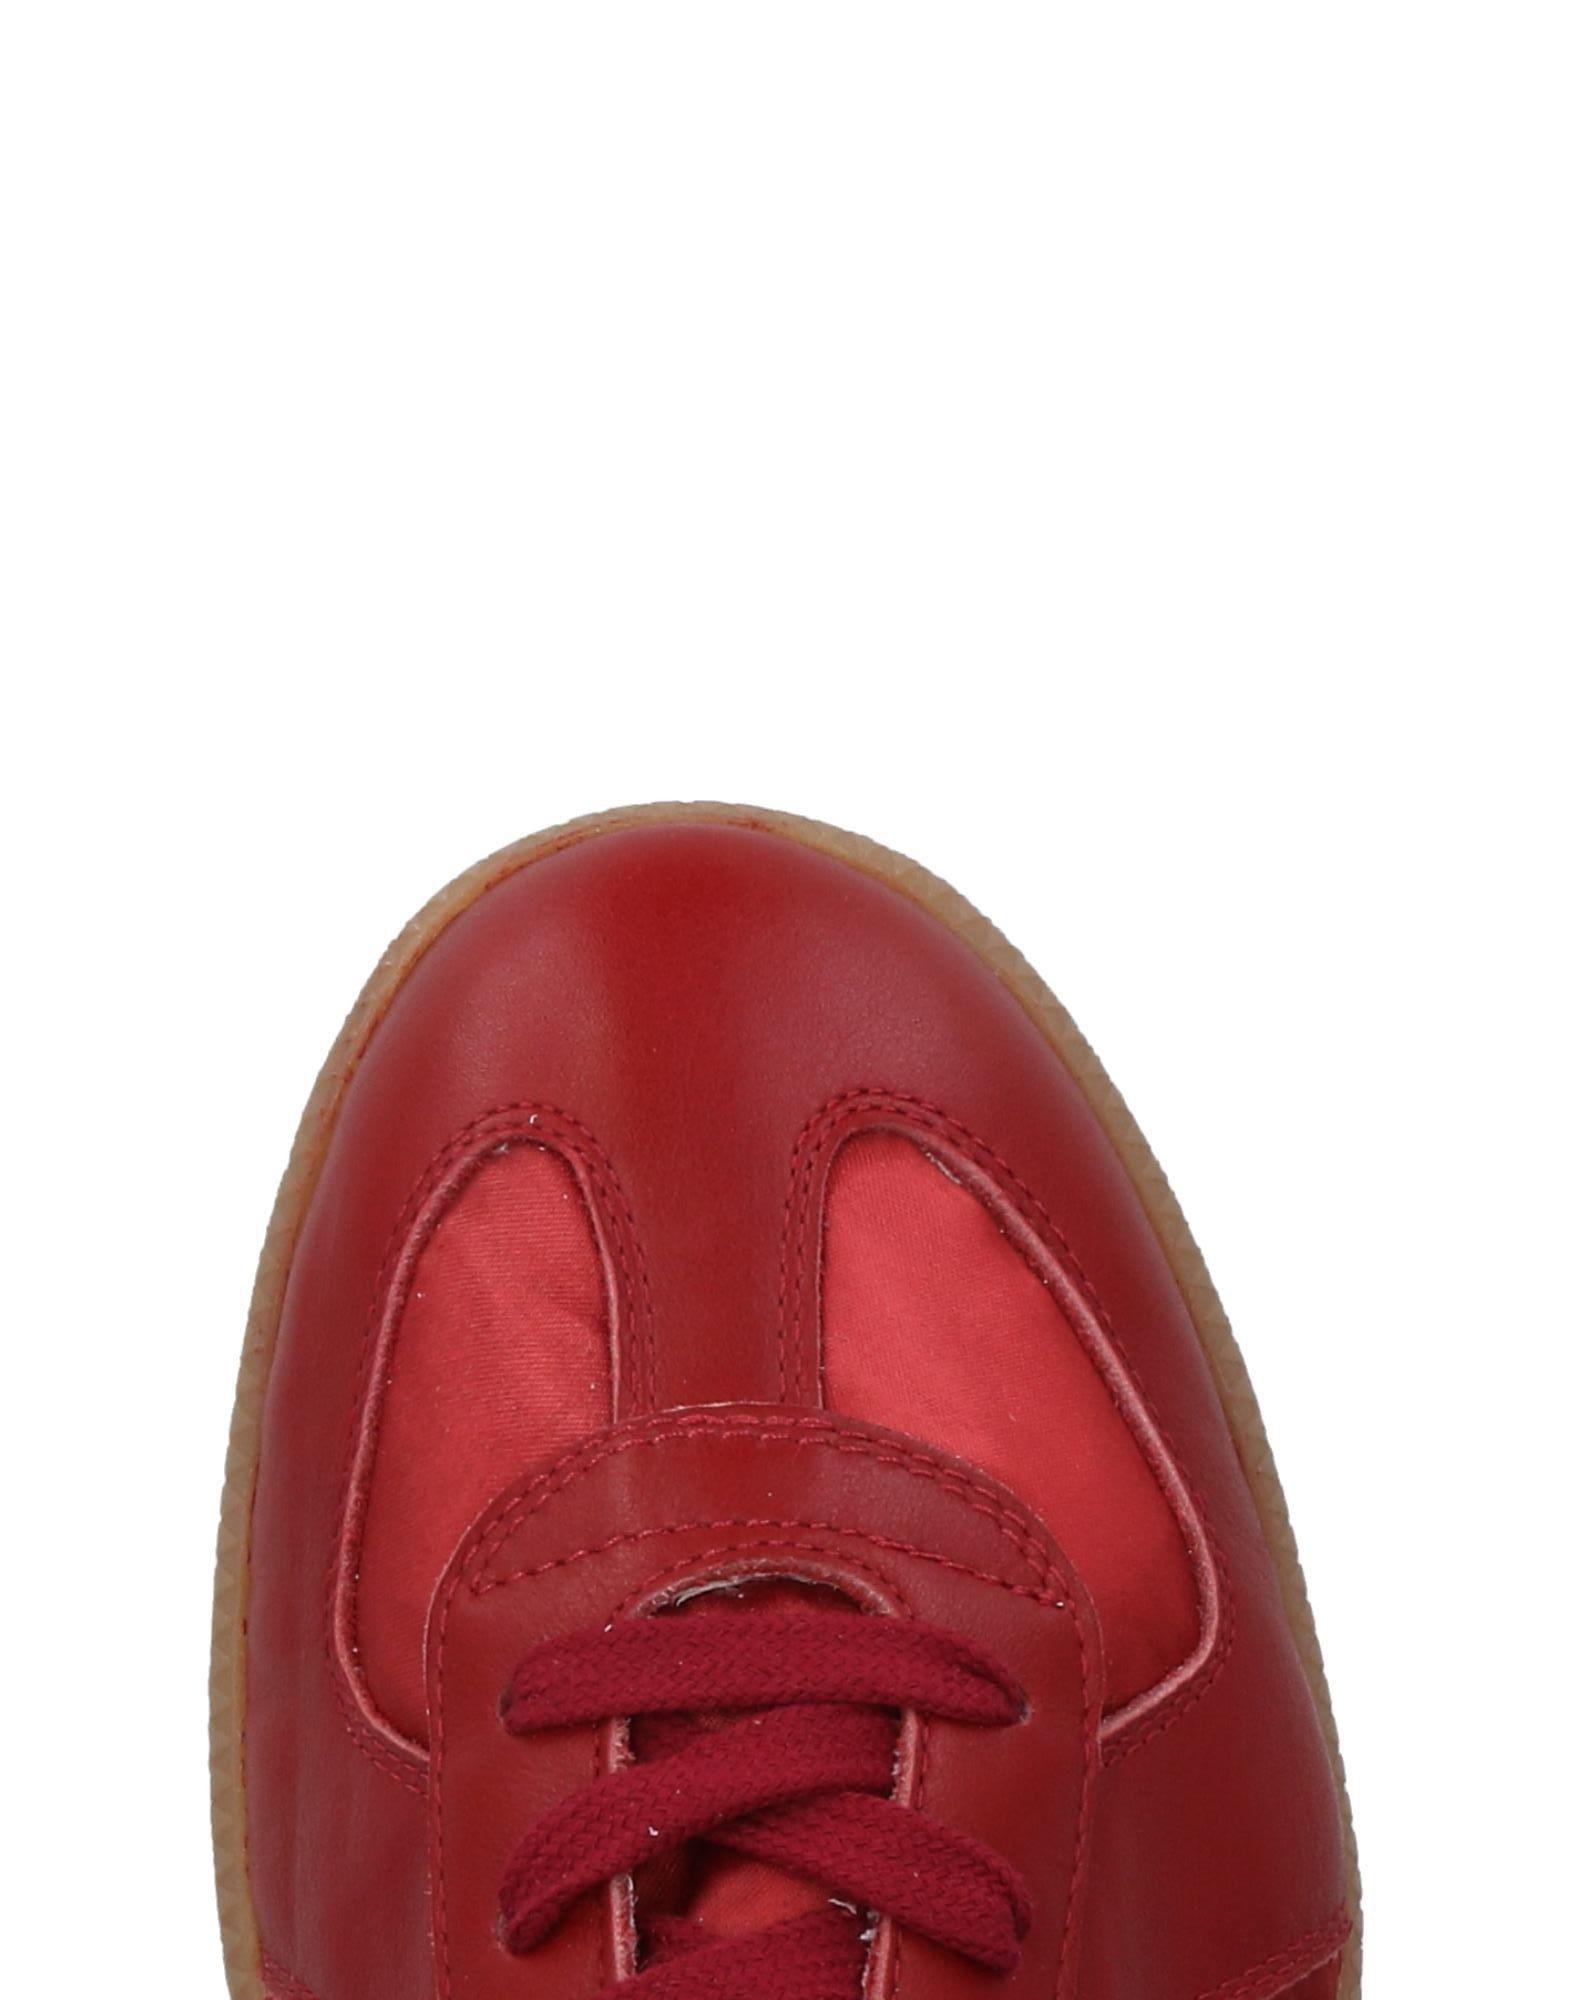 Maison 11472023HV Margiela Sneakers Herren  11472023HV Maison Gute Qualität beliebte Schuhe 344eea